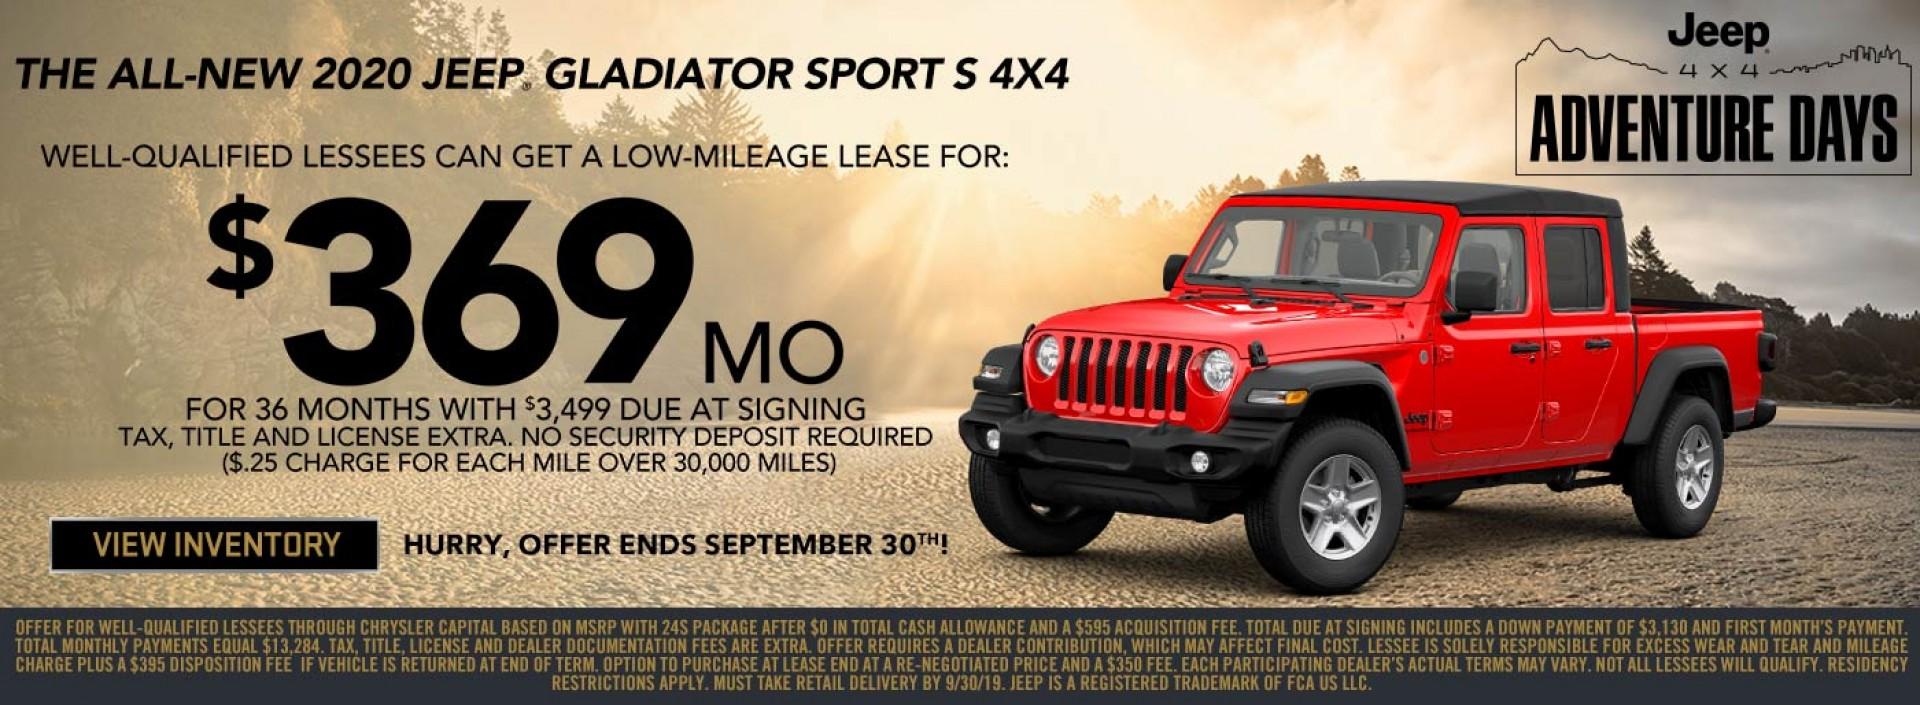 MWBC-2020Jeep-Gladiator-SEPT-Lease